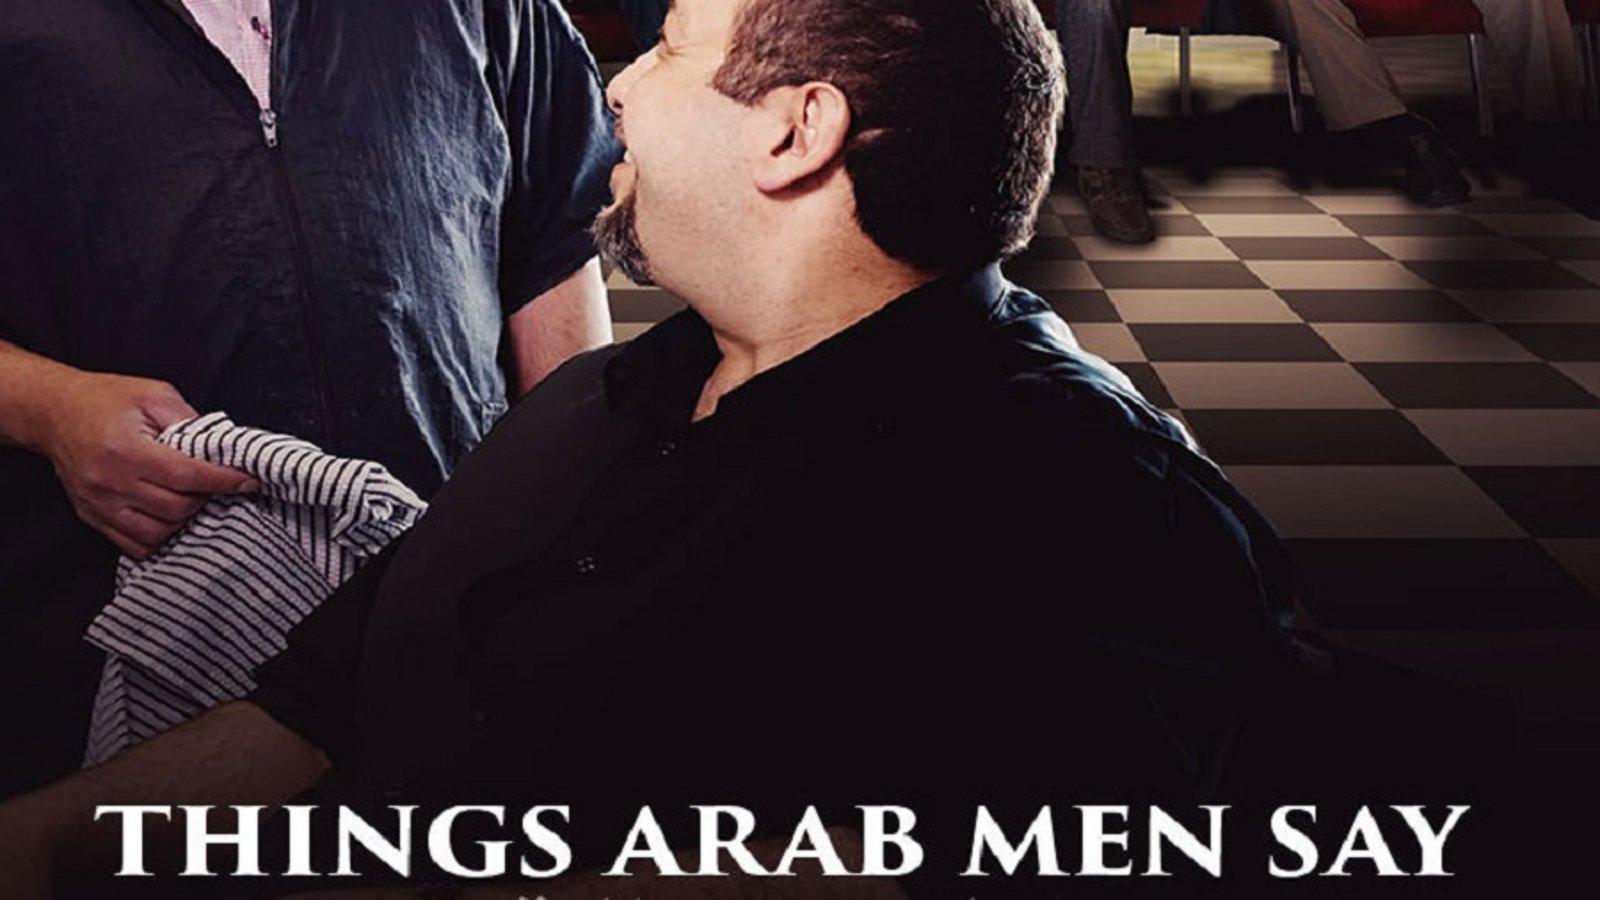 Things Arab Men Say - Eight Men Discuss Being Arab in Canada